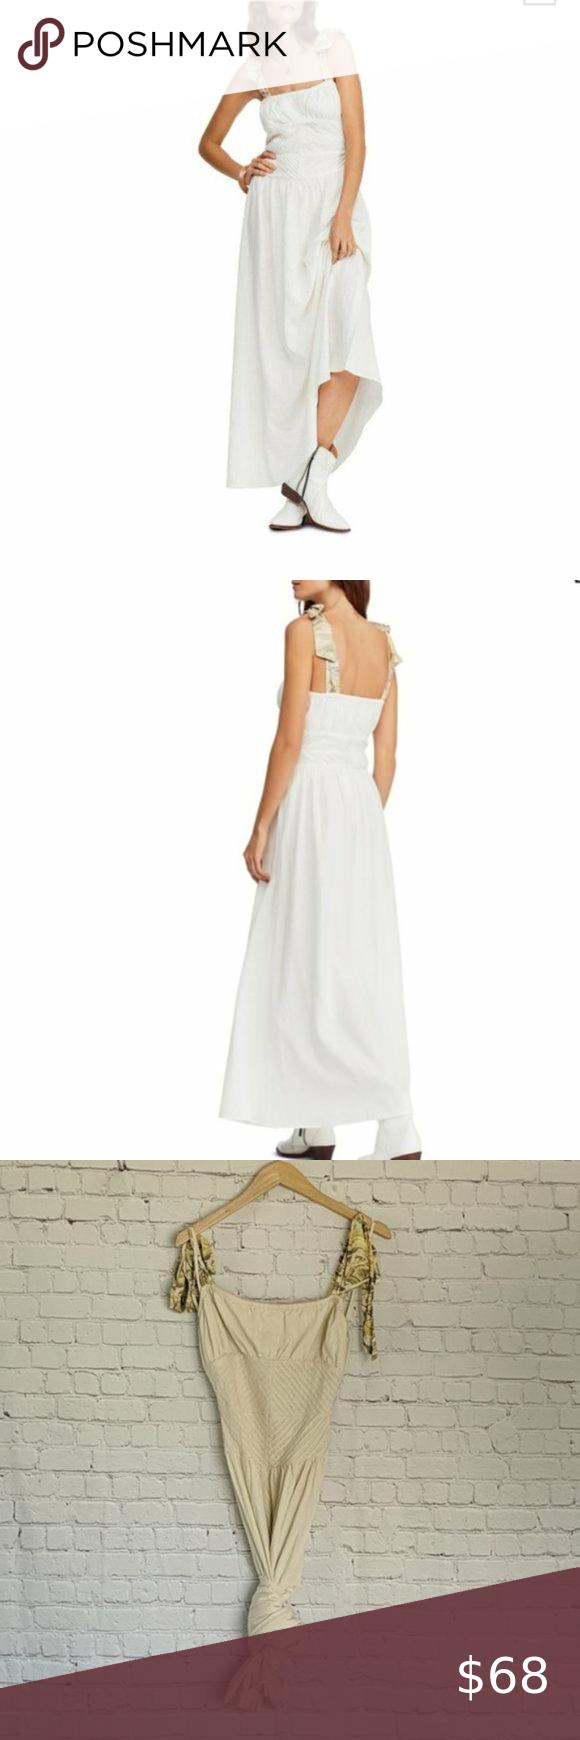 Free People Ecru Santorini Maxi Dress 4 Description Ruched And Shirred This Tie Strap Dress Has A Midi Length Wit Free People Maxi Dress Maxi Dress Dresses [ 1740 x 580 Pixel ]